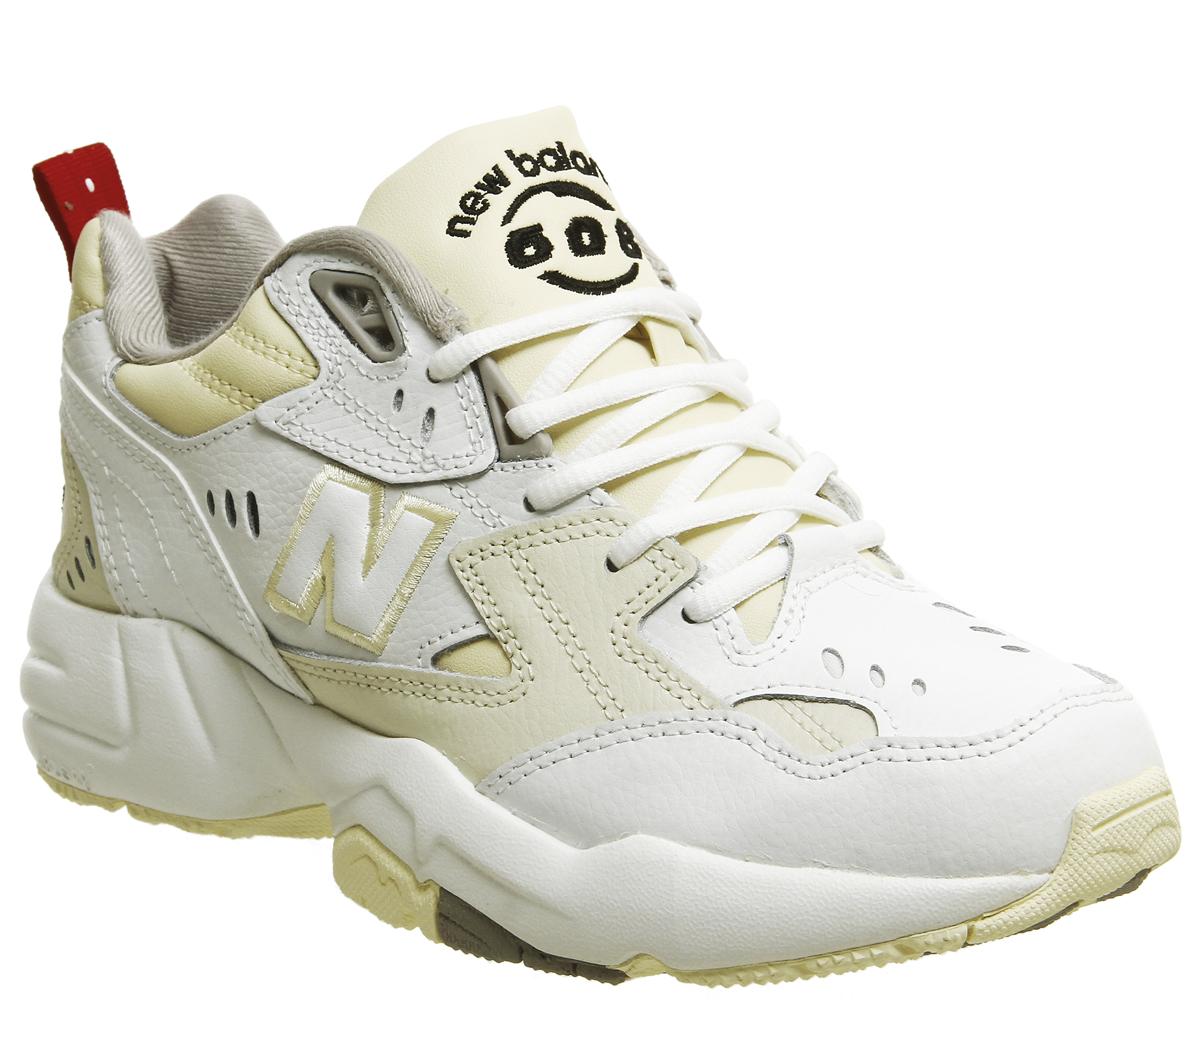 a499099d257 Dettagli su Donna New Balance 608 Scarpe Sportive Bianco Crema Scarpe da  Ginnastica